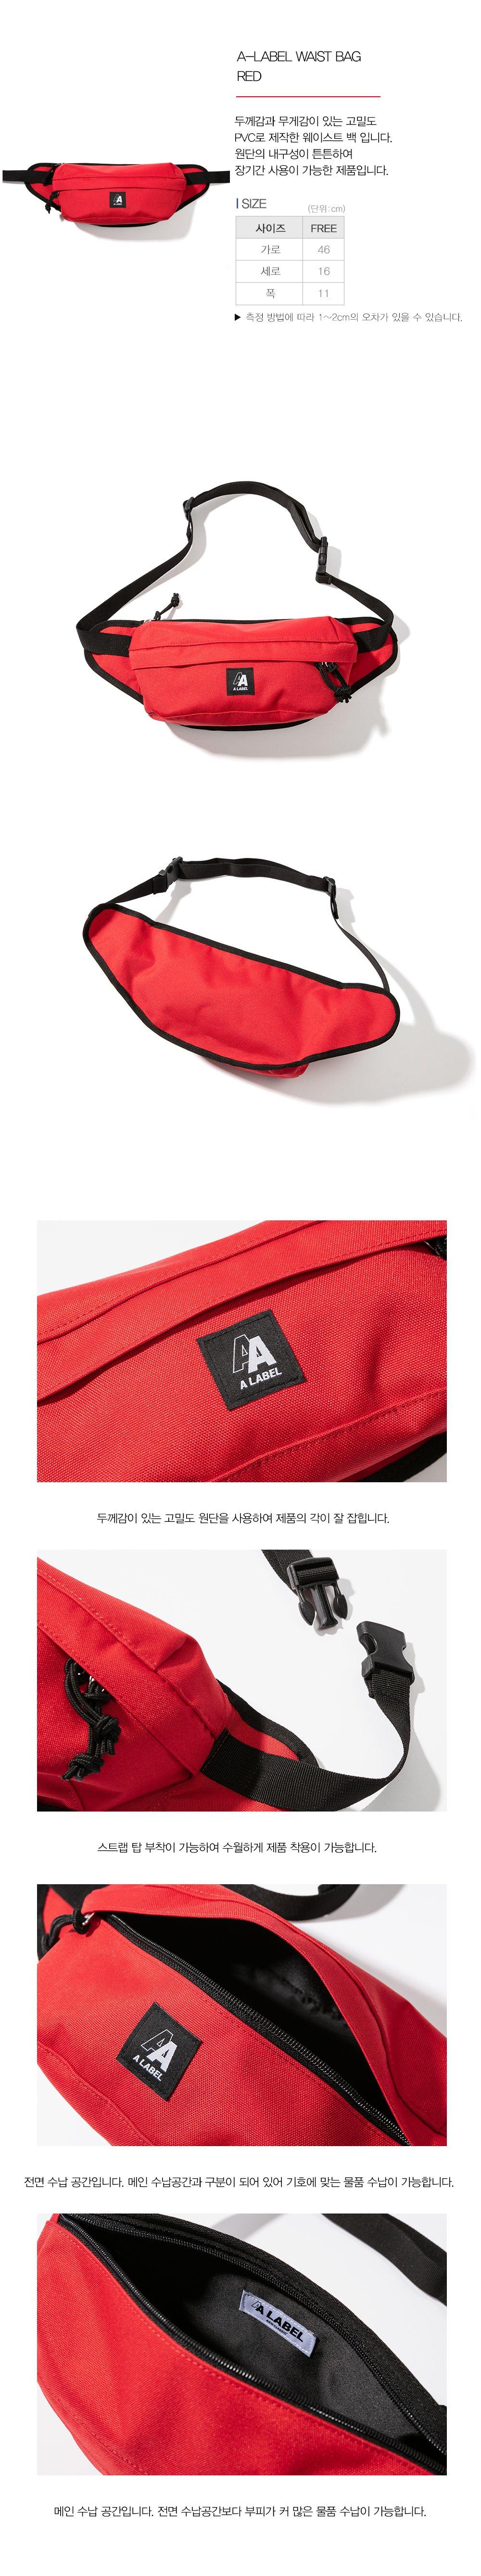 bag2_r_01.jpg